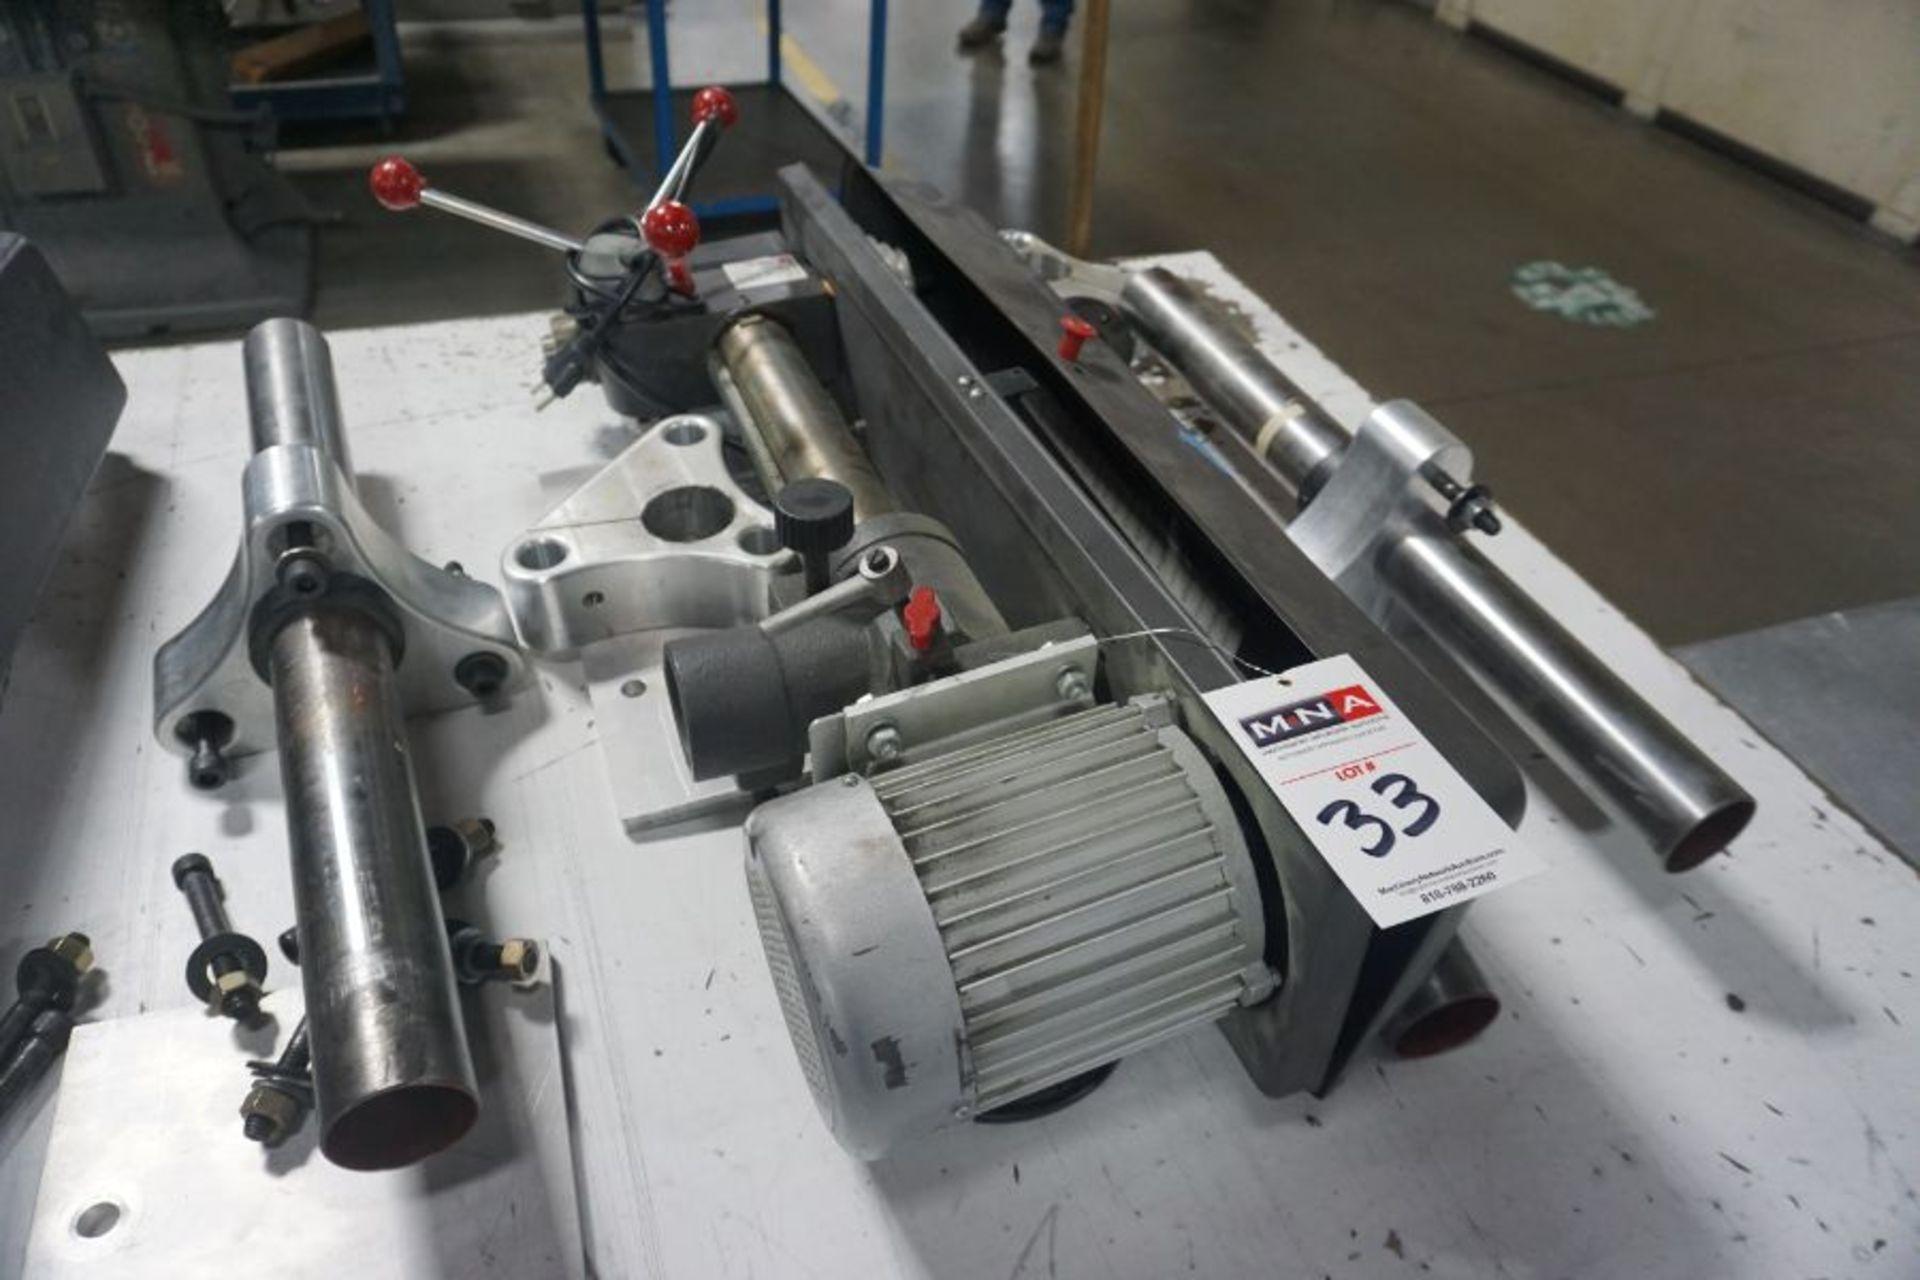 Dayton 33'' Radial Arm Drill Press - Image 4 of 5